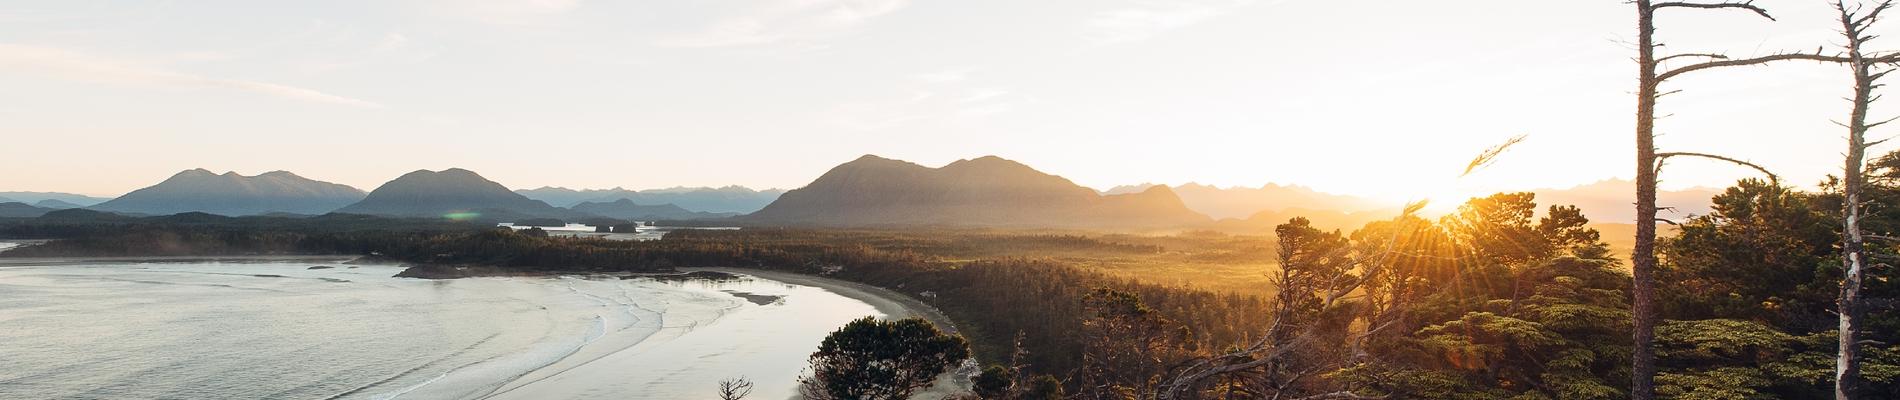 Tofino Sunset | Johan Lolos